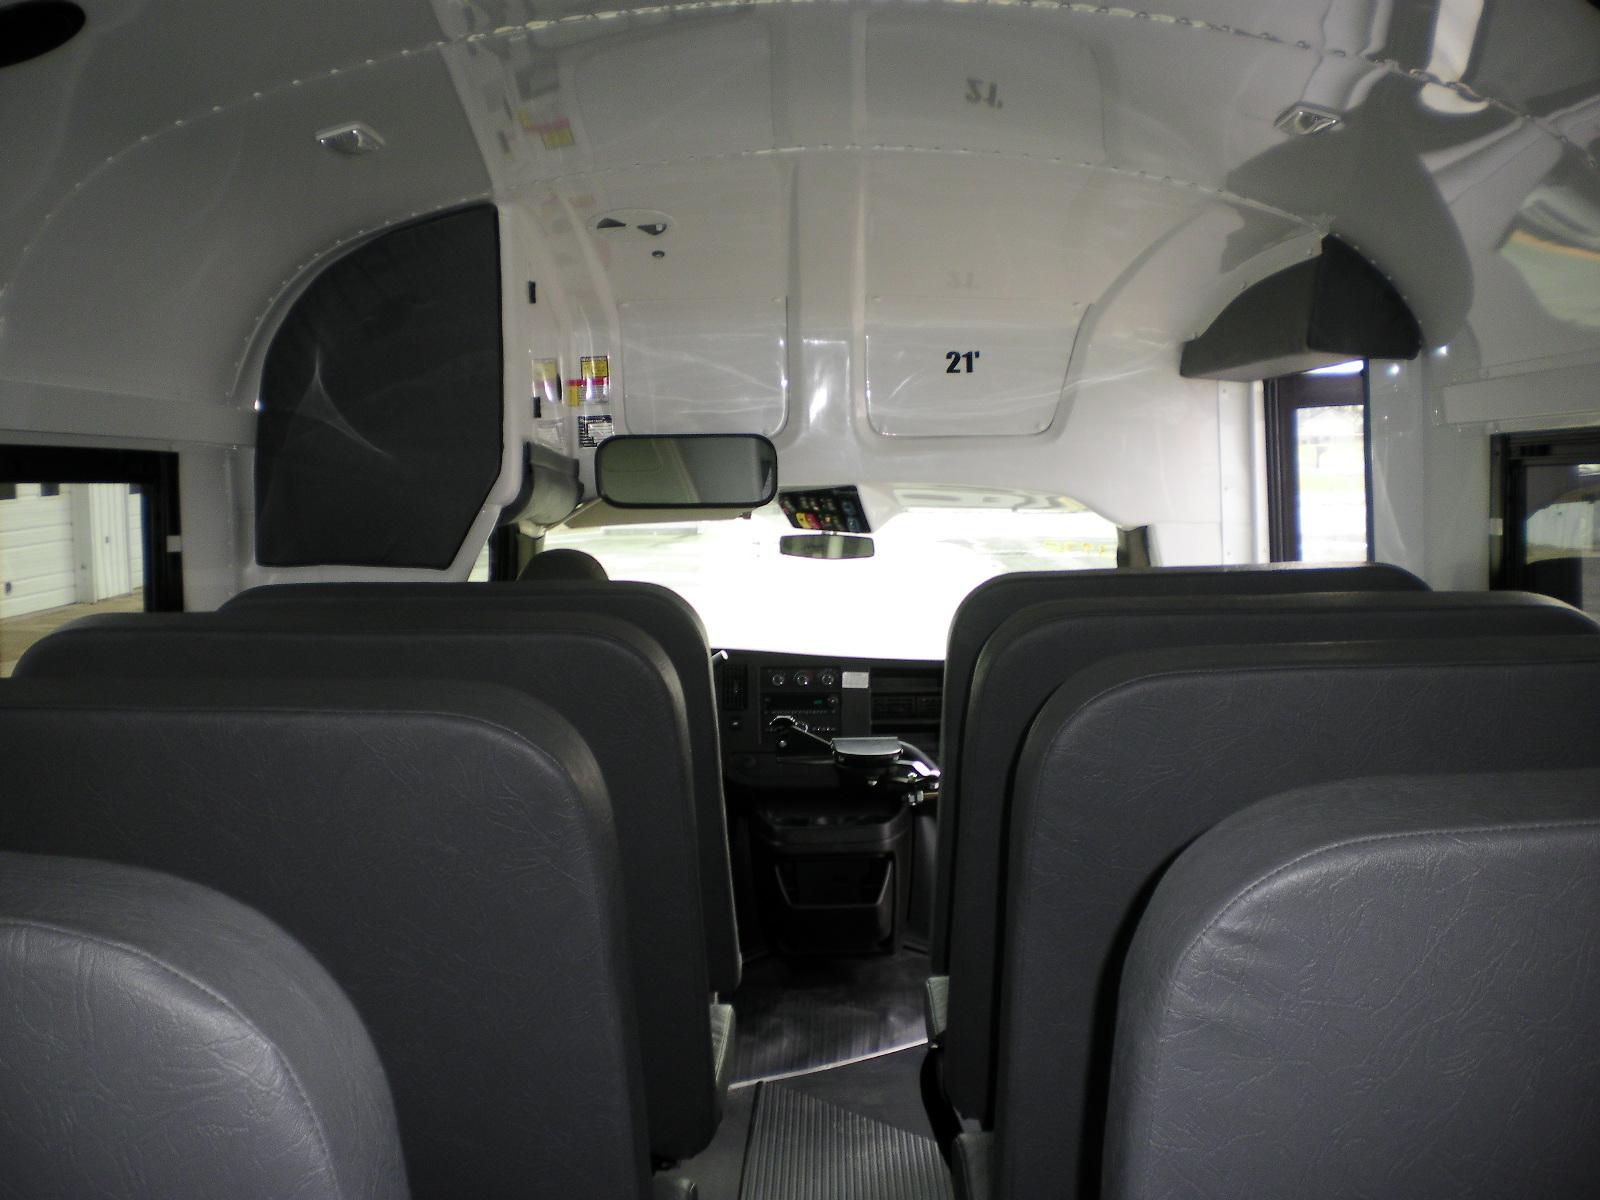 2019 Trans Tech School Bus W Wheelchair Lift